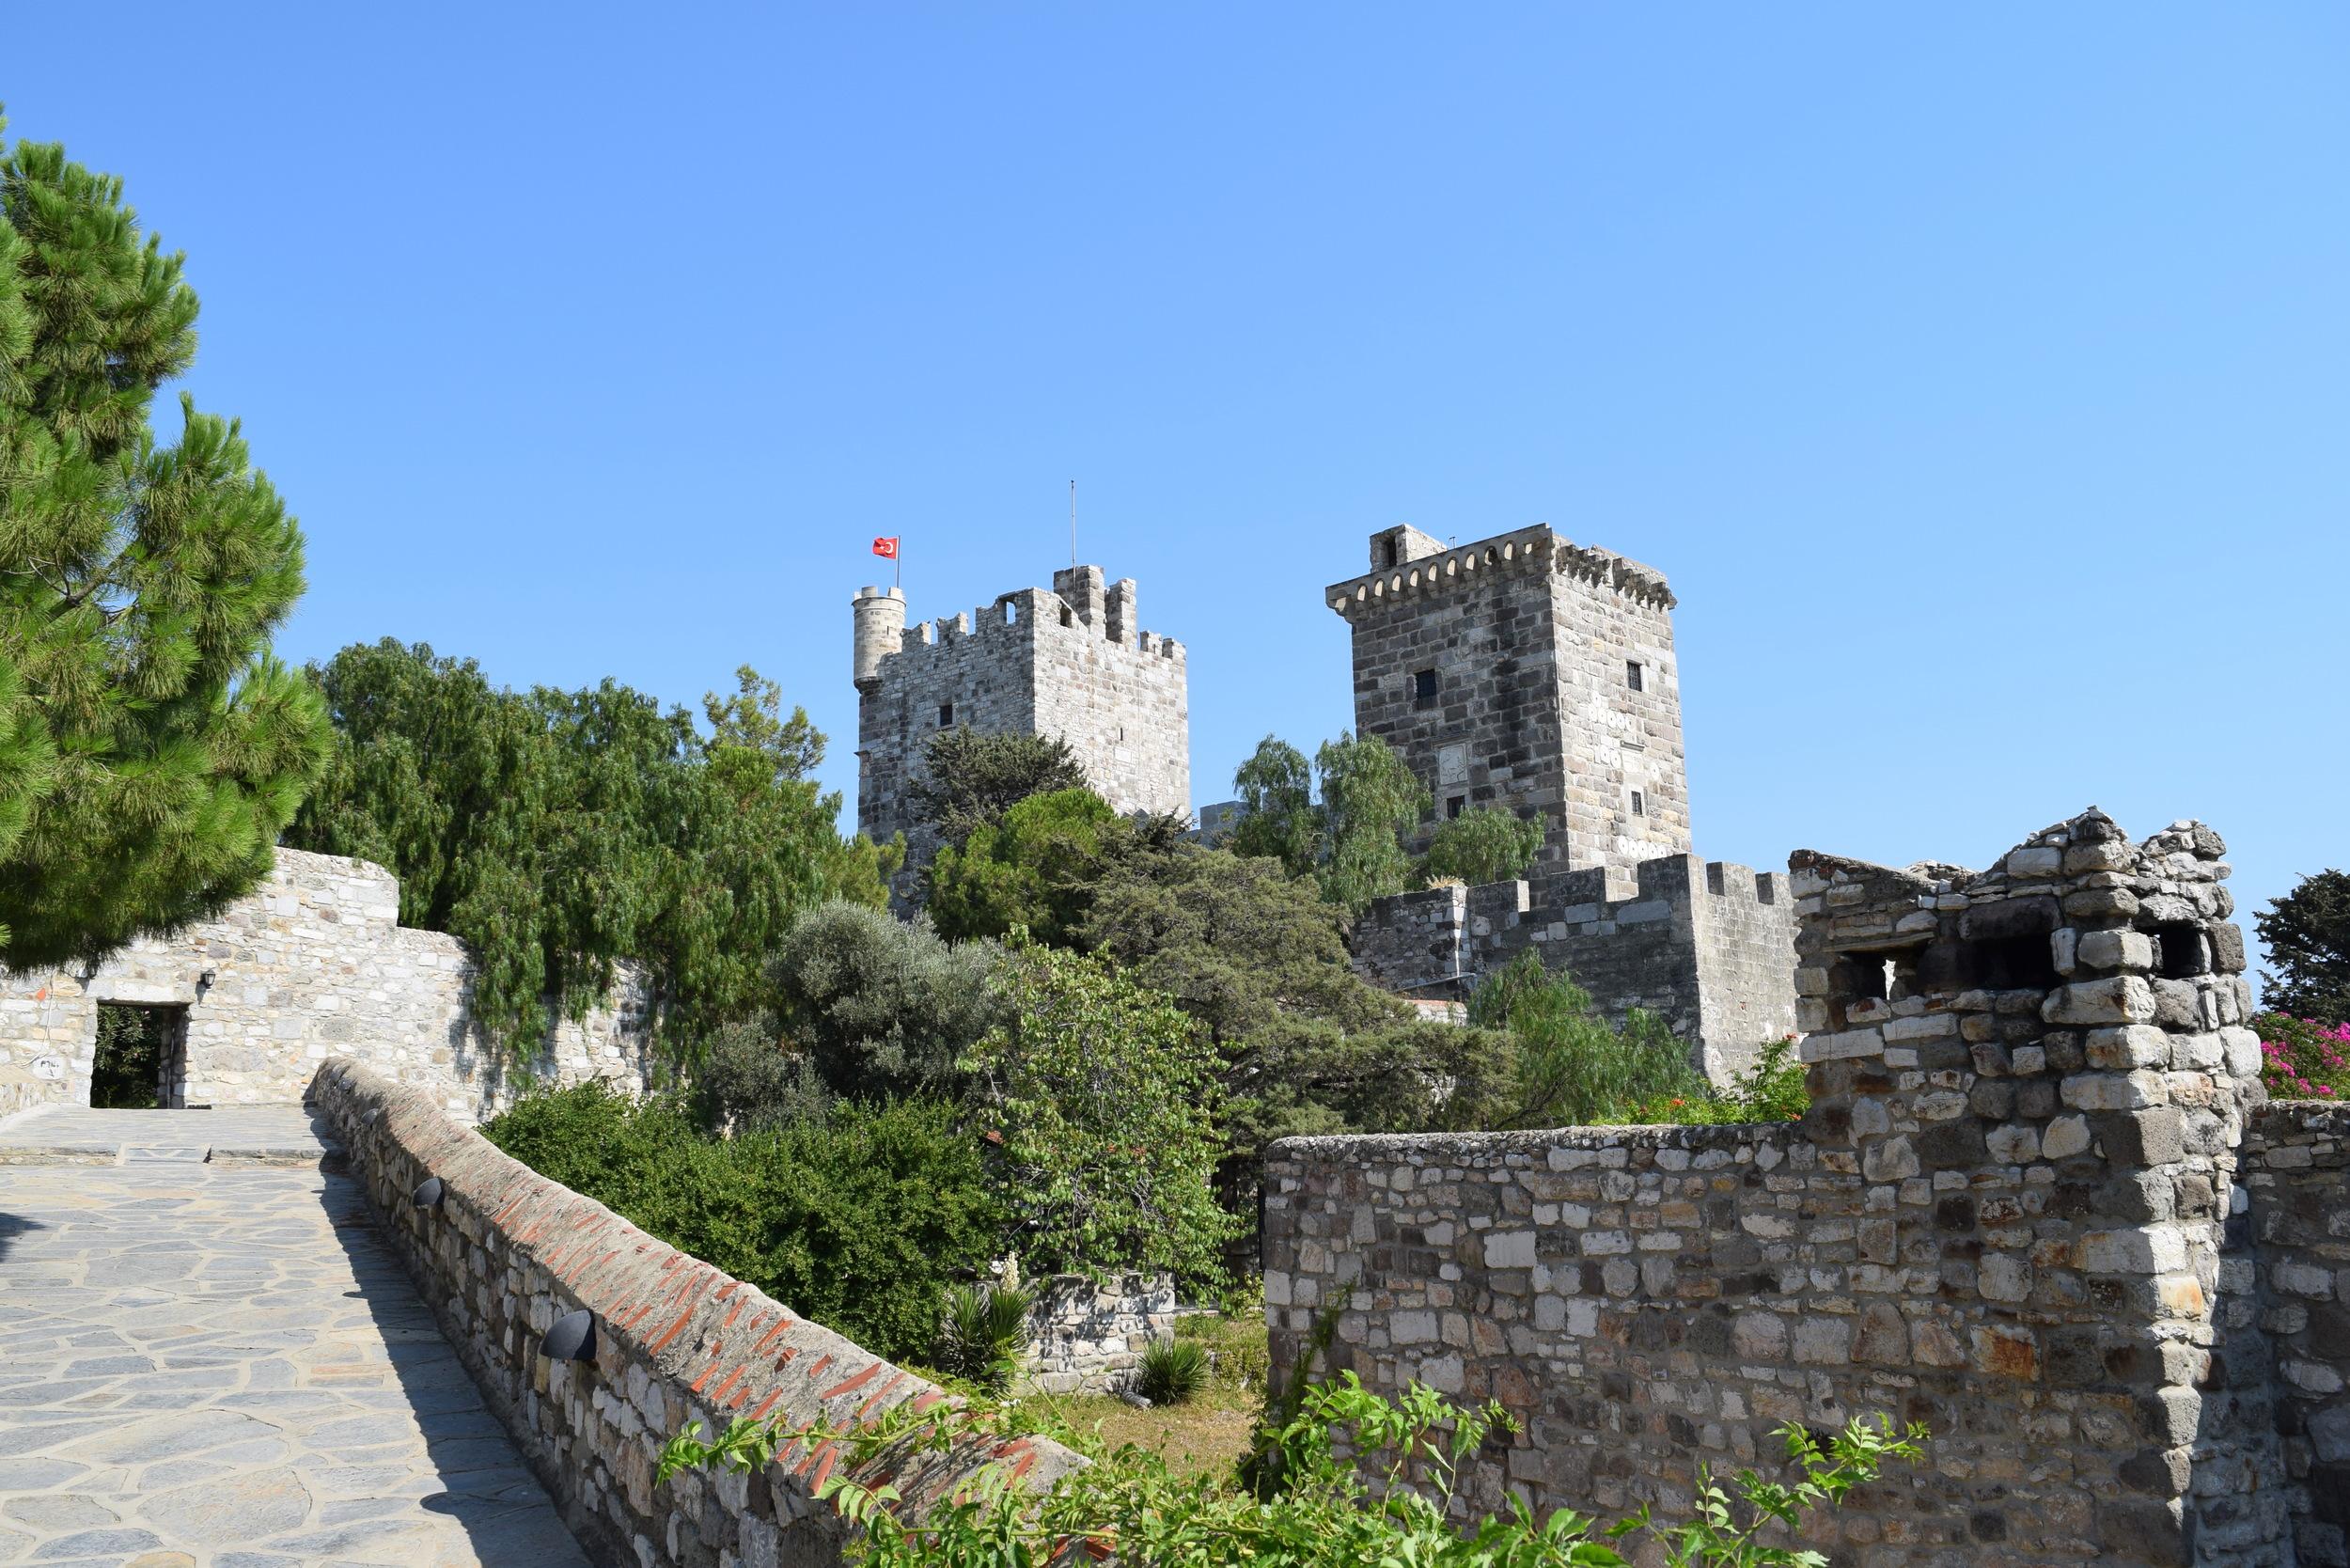 A view inside the castle